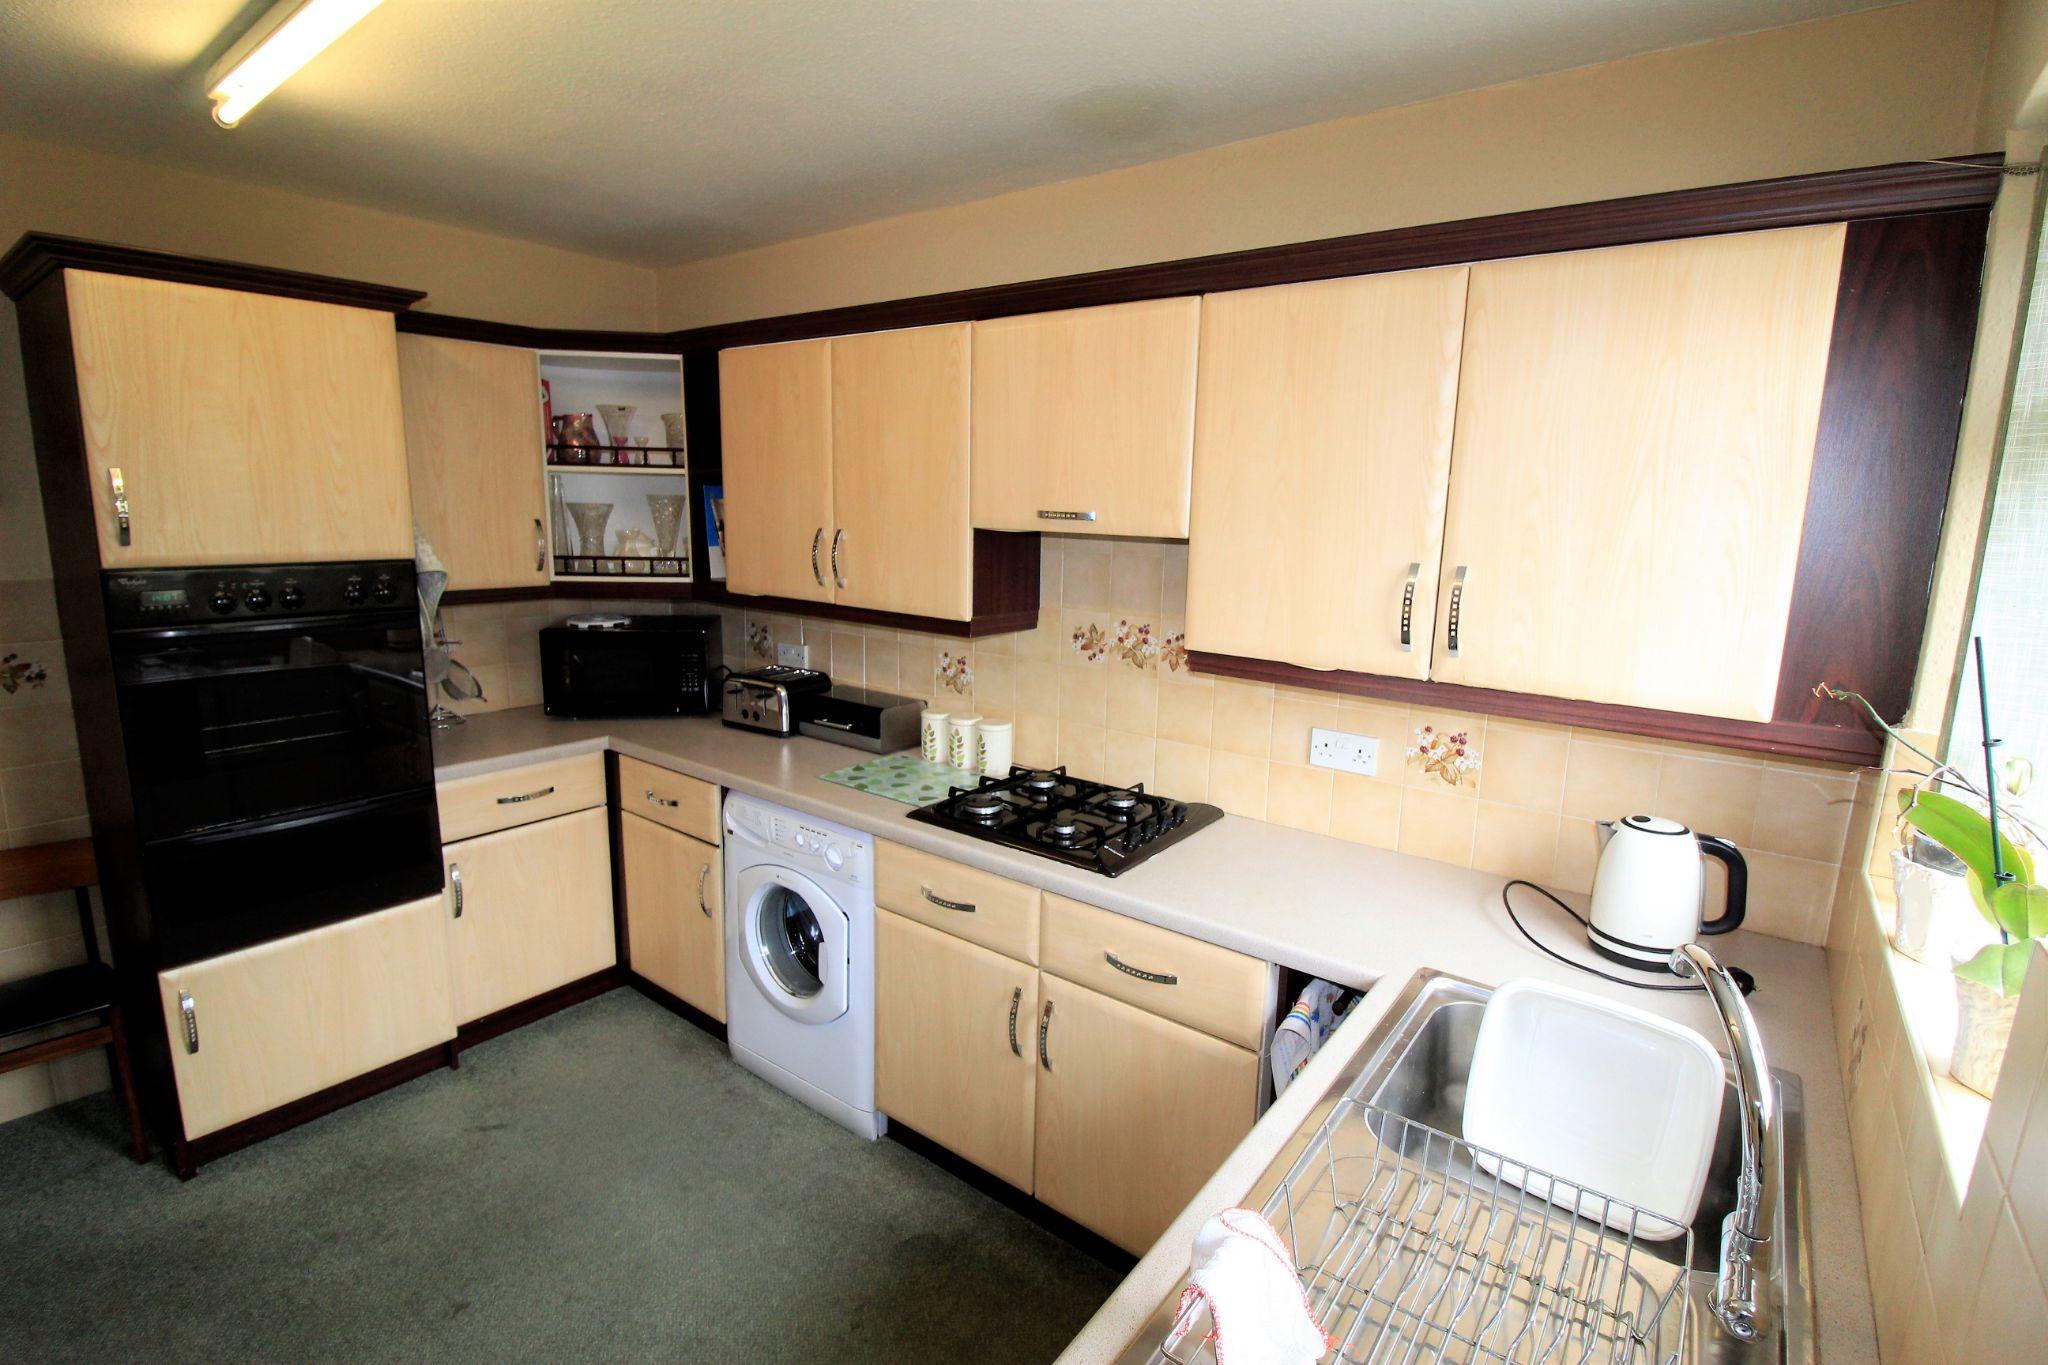 2 bedroom semi-detached bungalow SSTC in Bradford - Kitchen